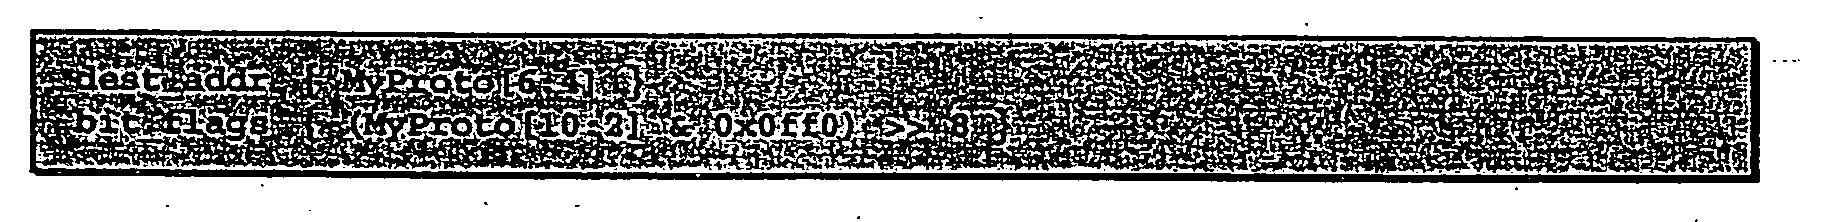 Figure US20040148382A1-20040729-P00006